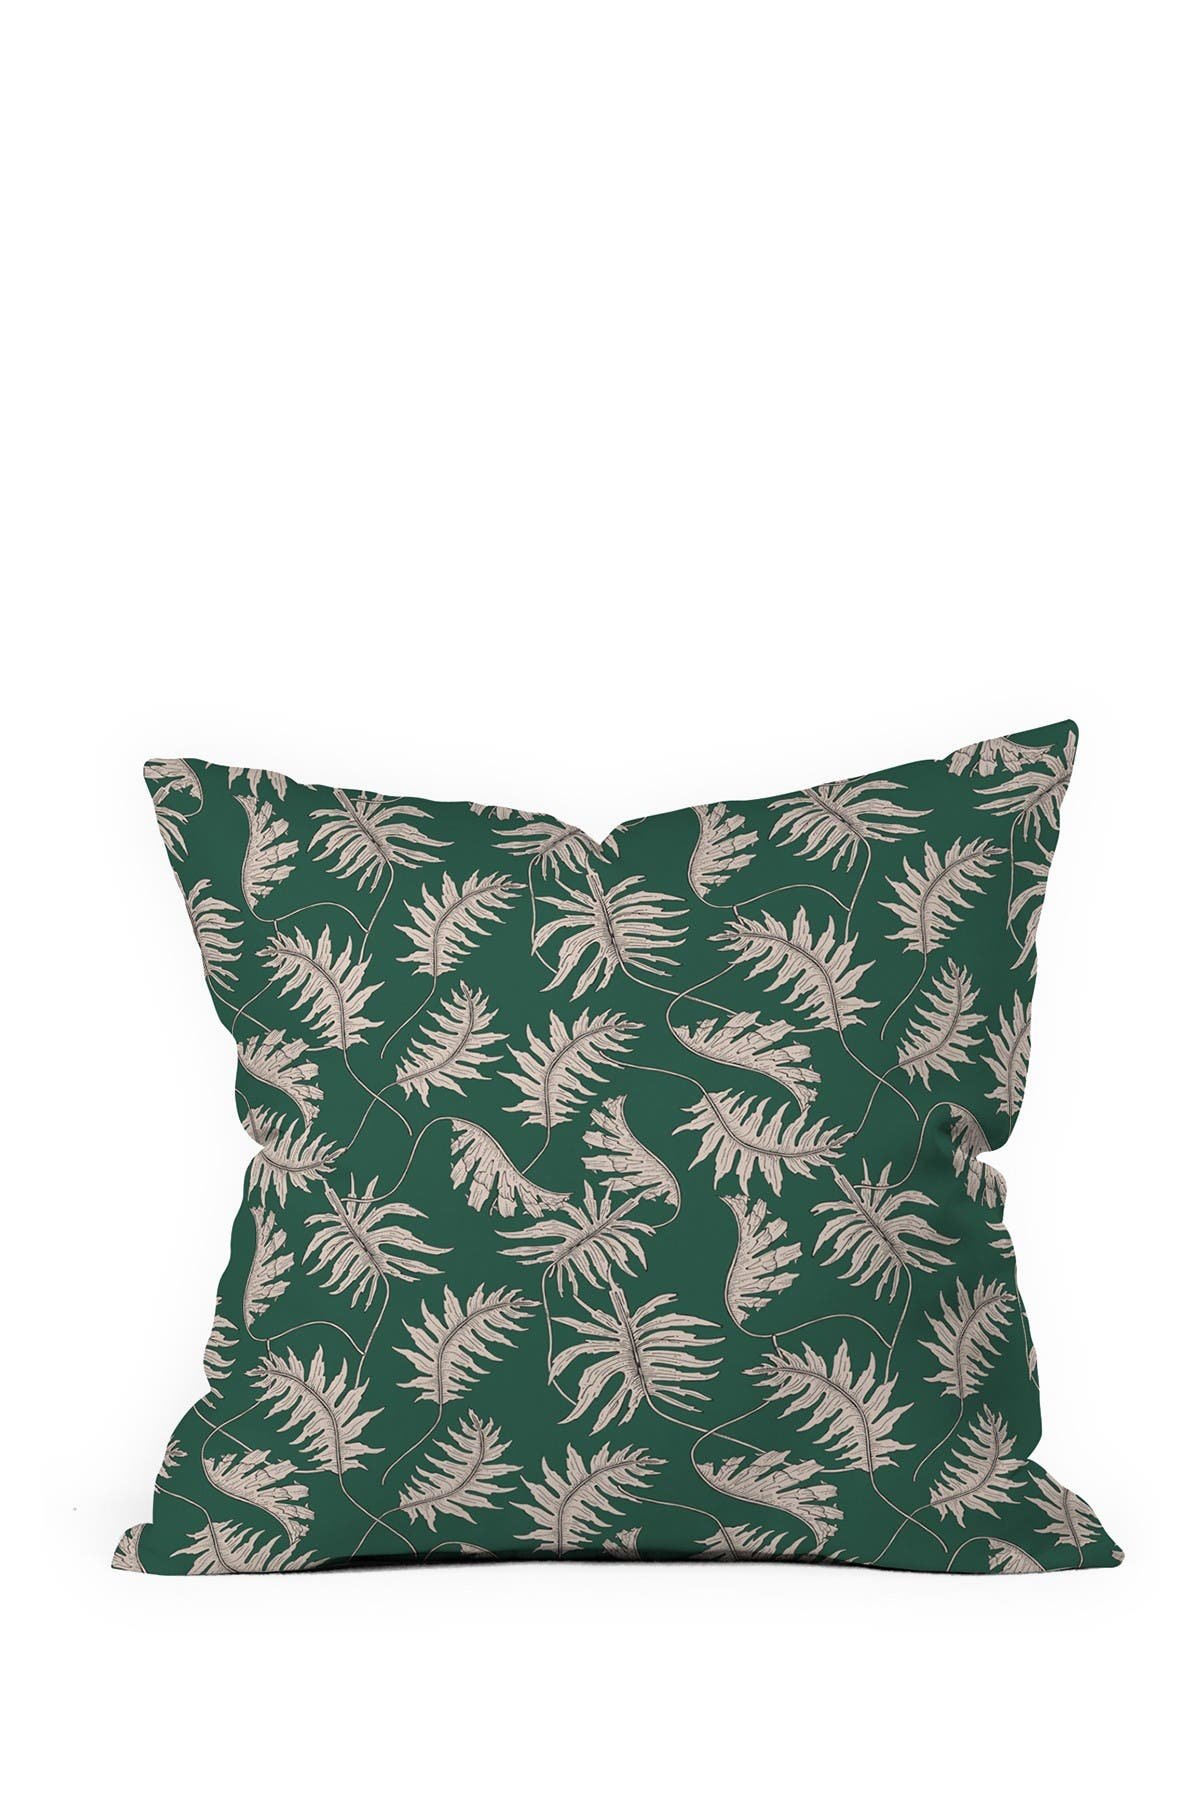 Deny Designs Holli Zollinger Urban Jungle Palm Throw Pillow Nordstrom Rack